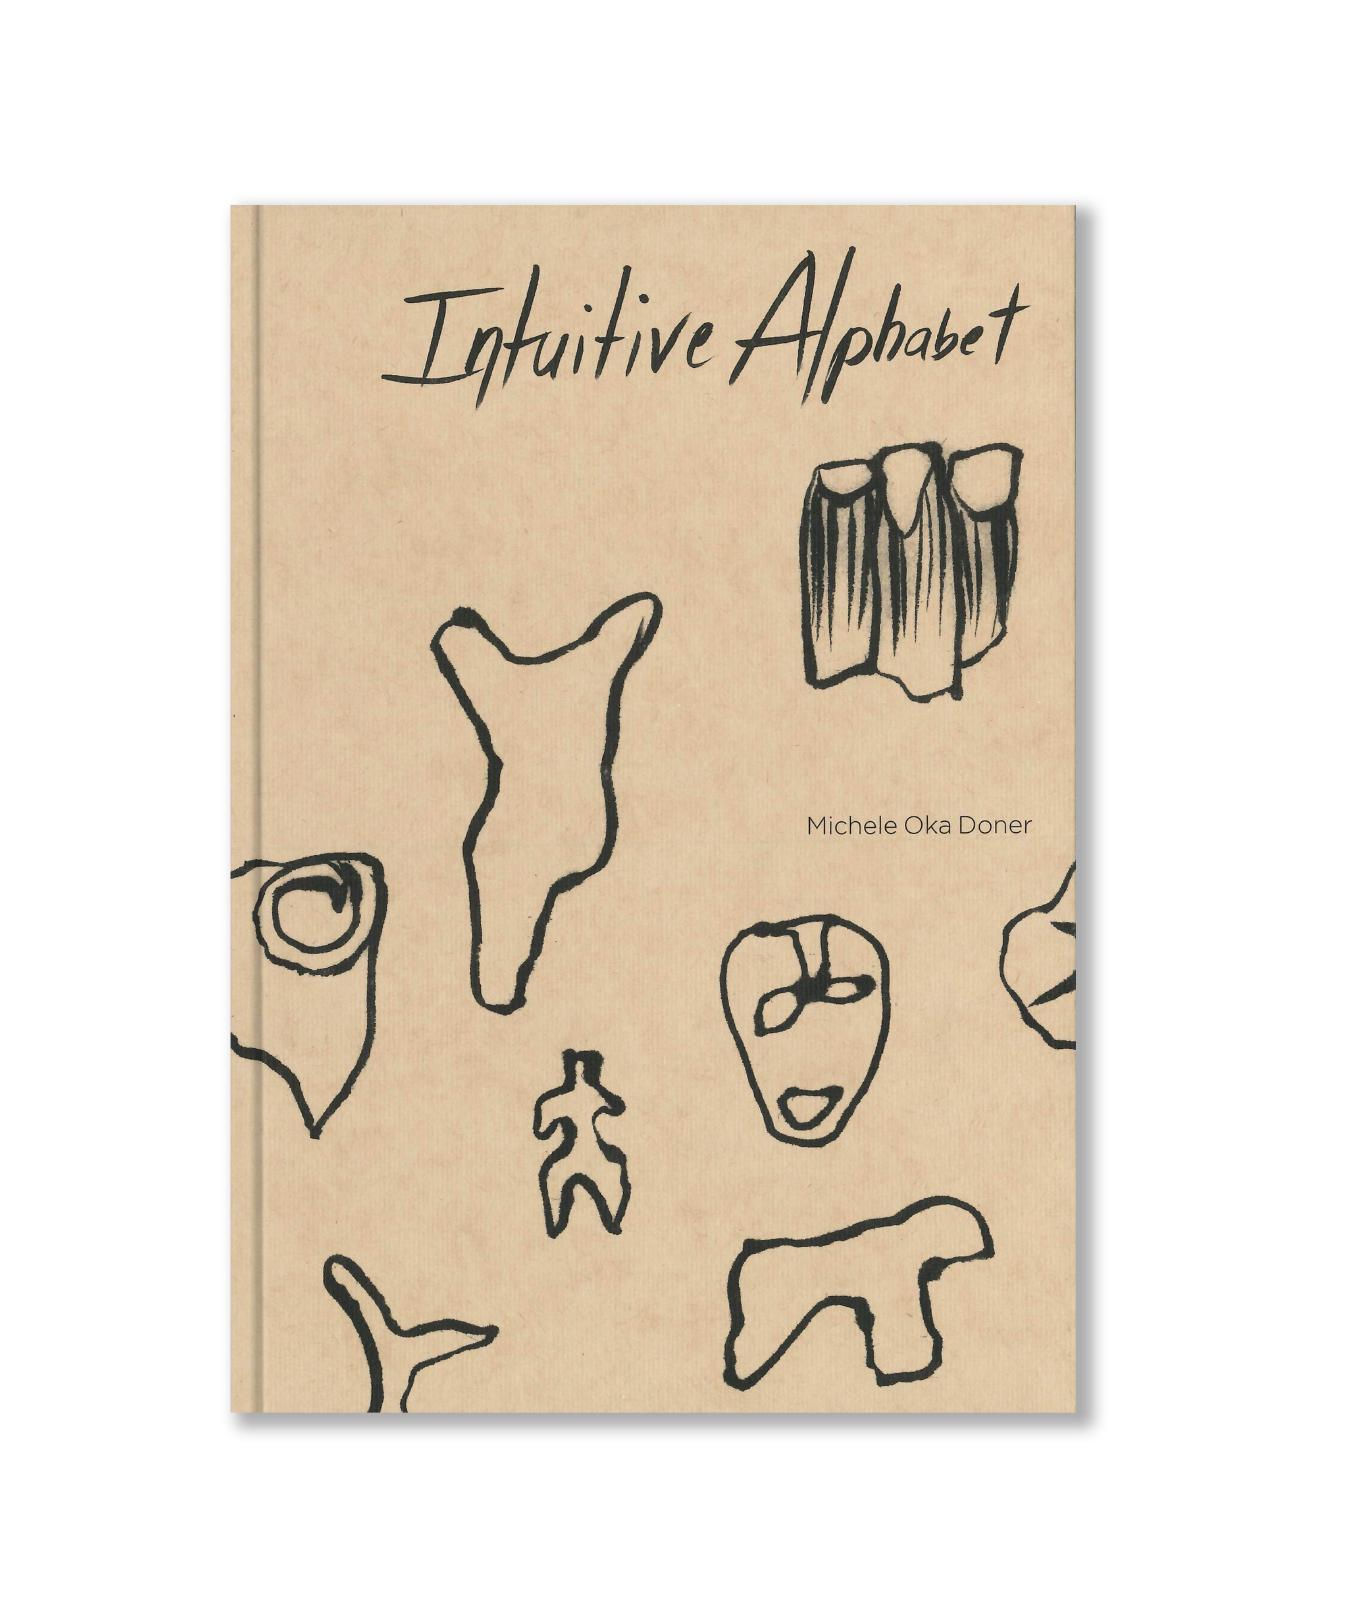 Intuitive Alphabet - Trade Edition